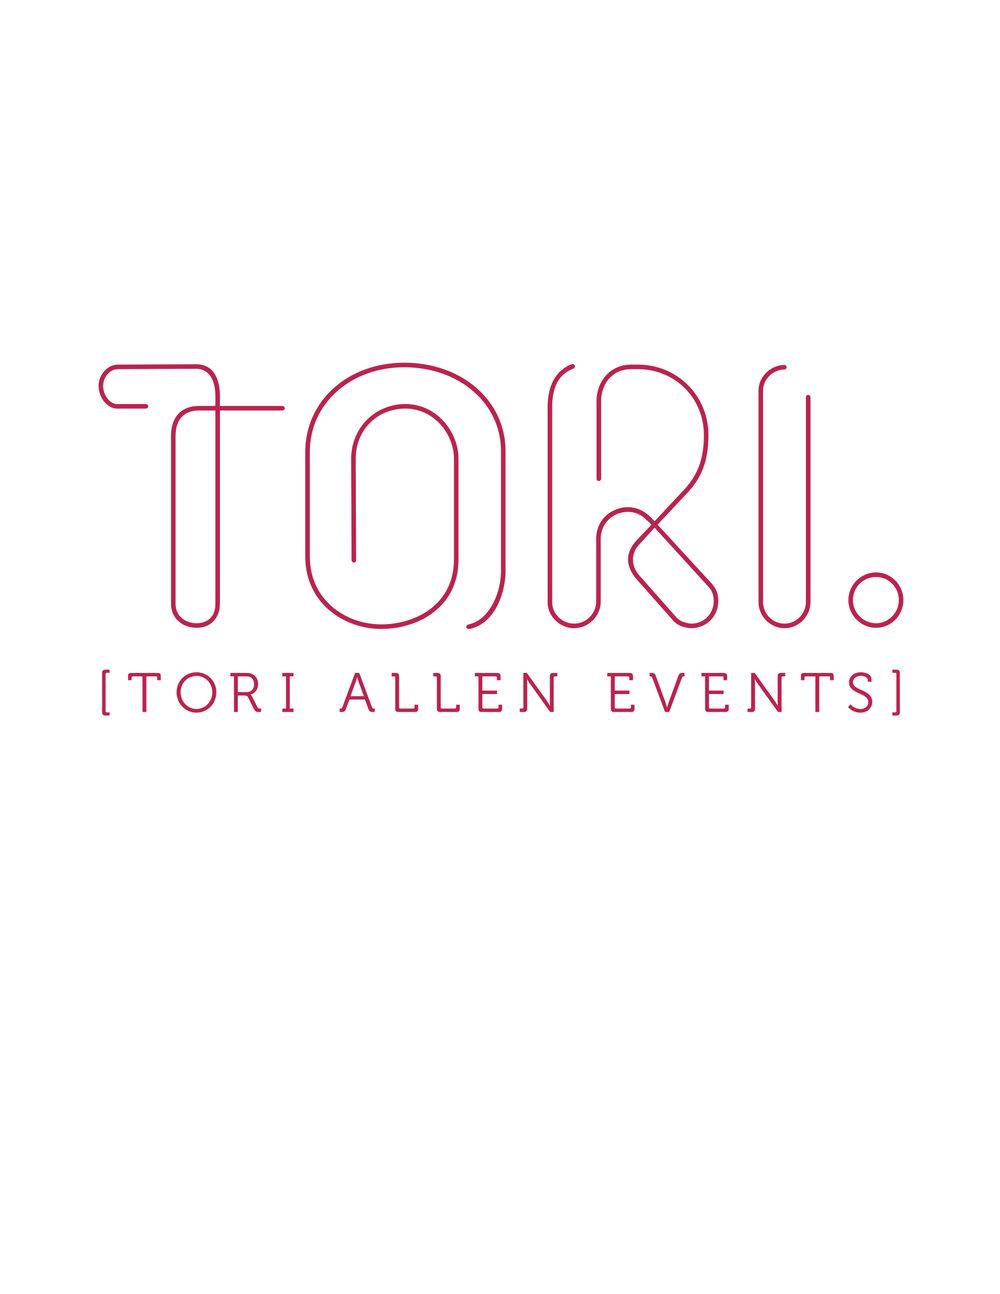 Tori Allen Events